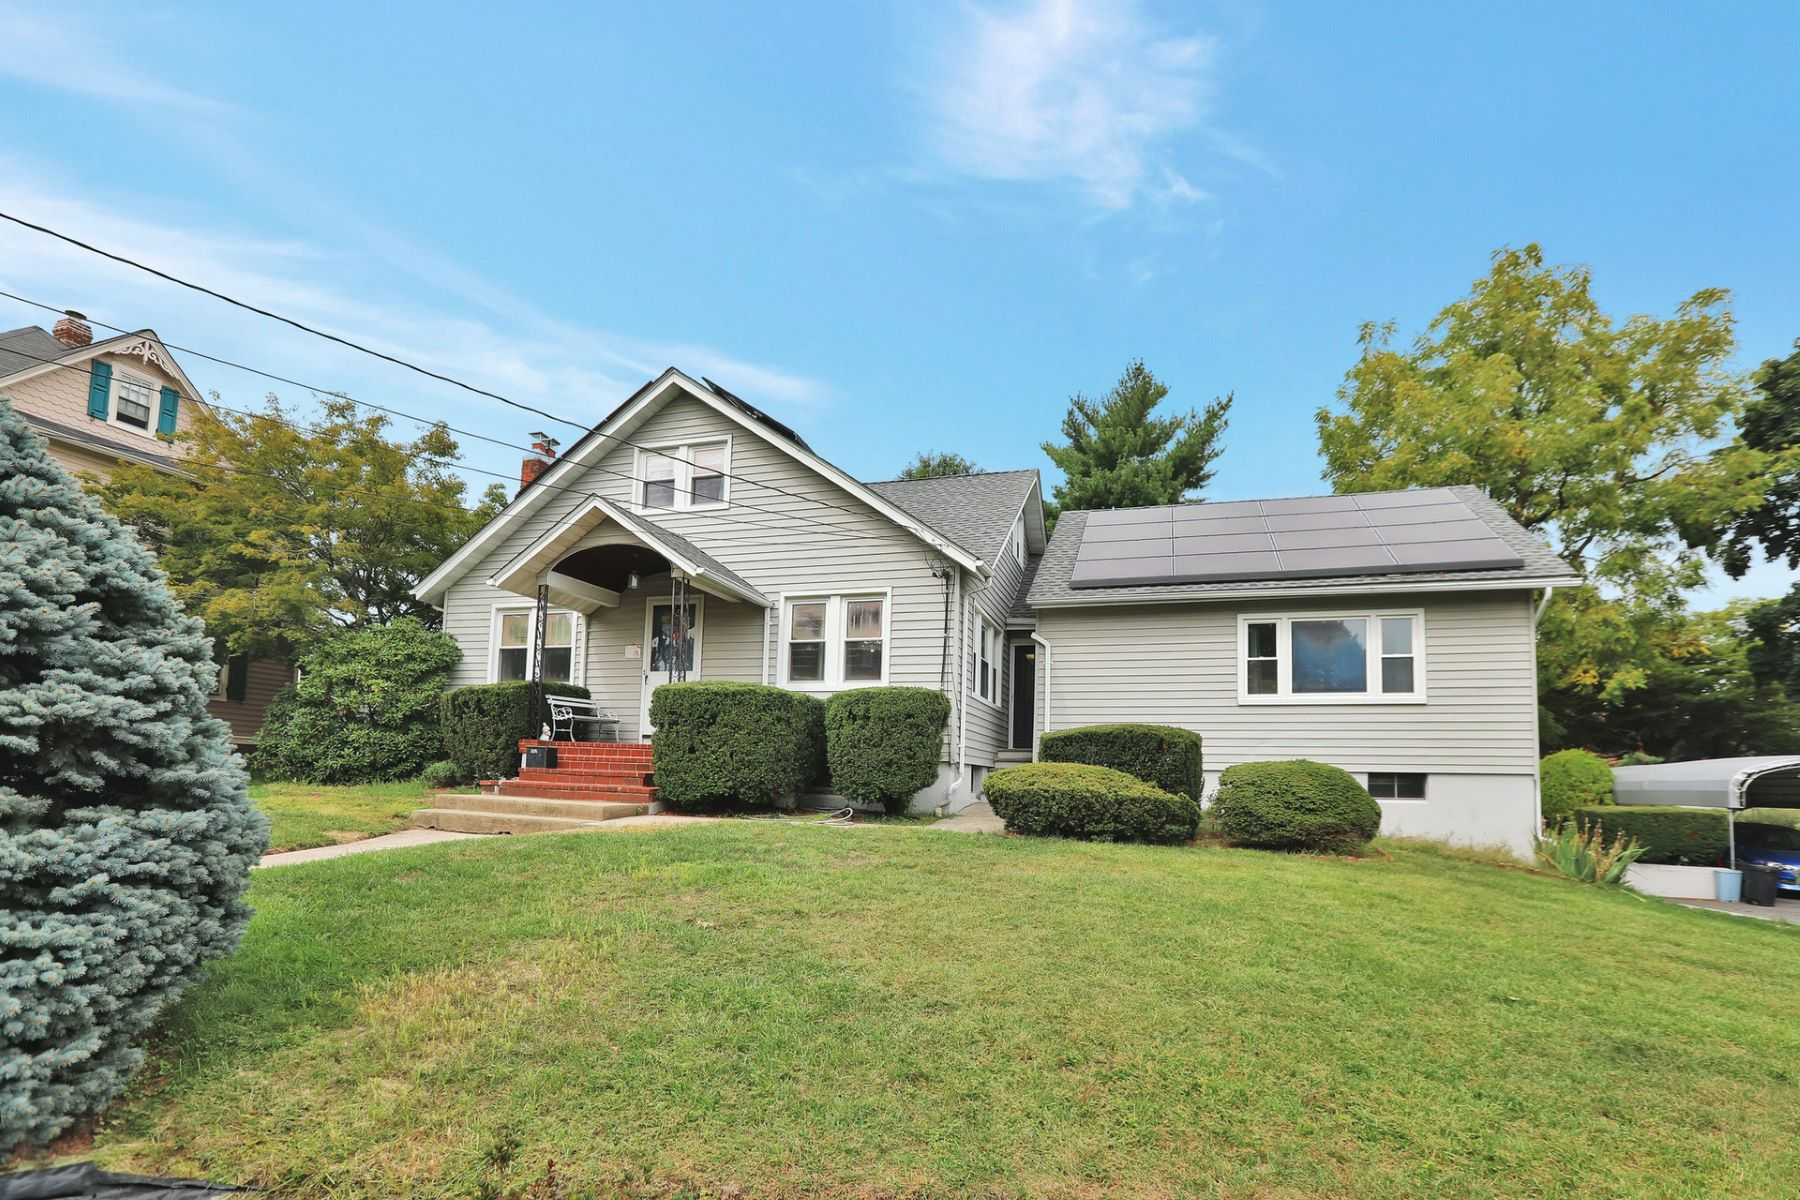 Single Family Homes для того Продажа на Welcome Home! 58 Larch Ave, Dumont, Нью-Джерси 07628 Соединенные Штаты